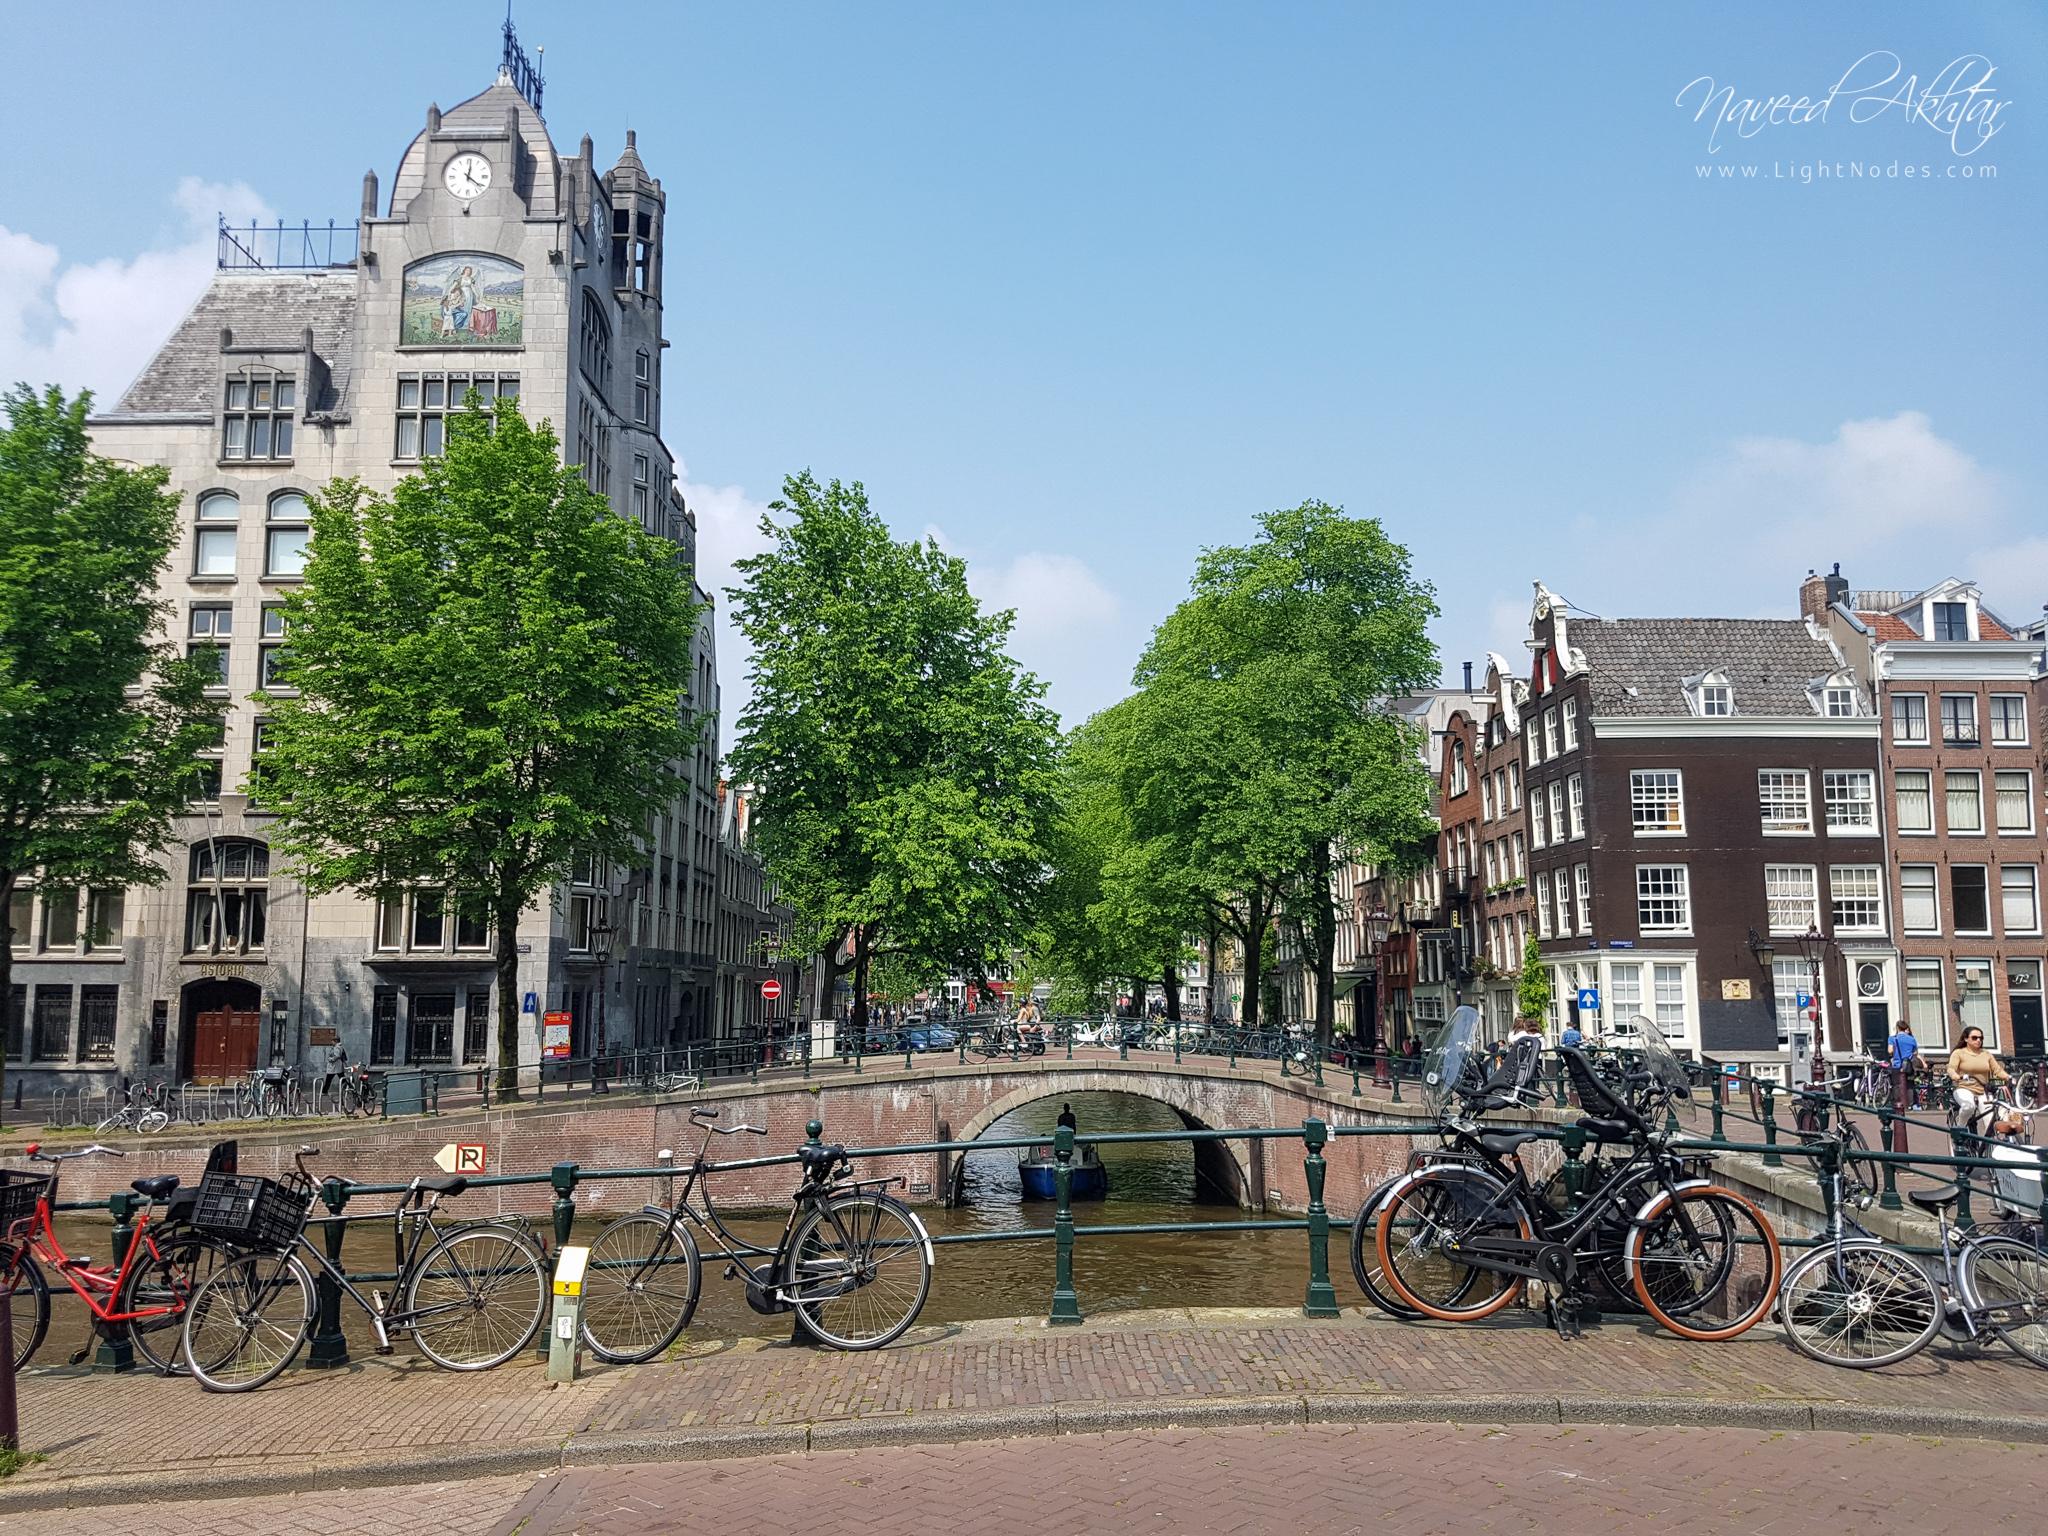 A Sunny Saturday in Amsterdam using Samsung S7 camera phone